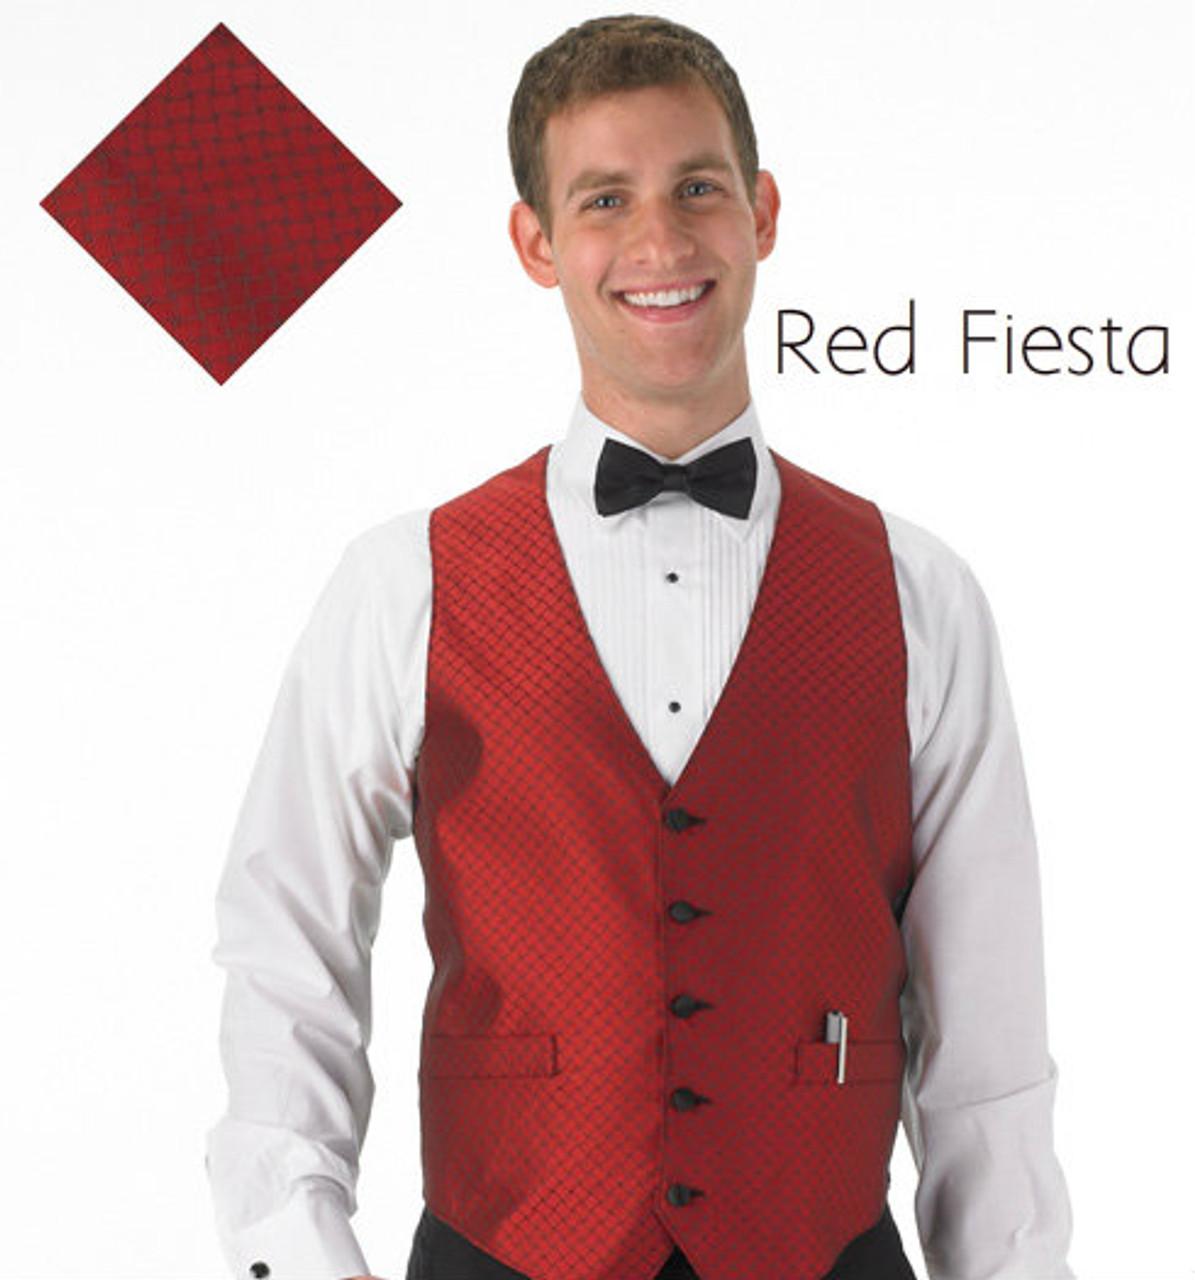 Red Fiesta